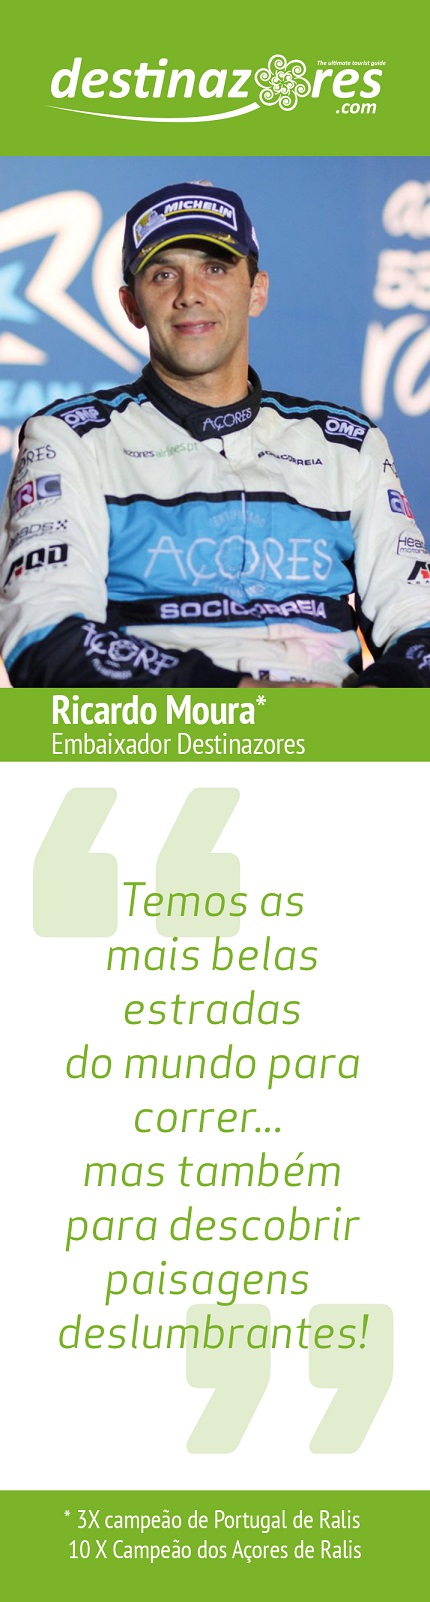 Embaixador Ricardo Moura